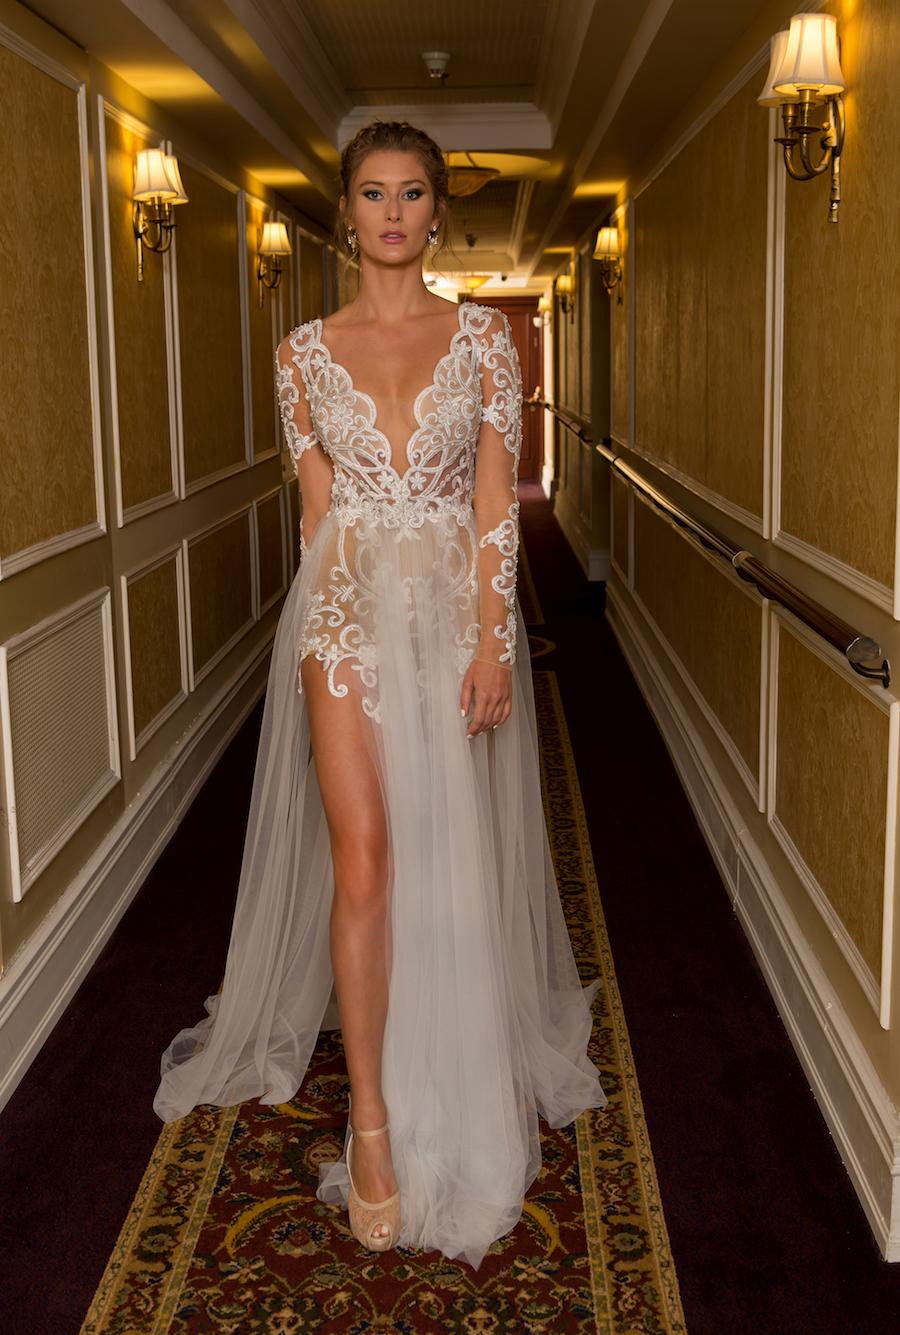 Naama and Anat Haute Couture, Wedding Dress Trends, 2018 Wedding Dress Trends, Naama and Anat Bridal, Couture Wedding Dress, Luxury Wedding Gown, Star Gown